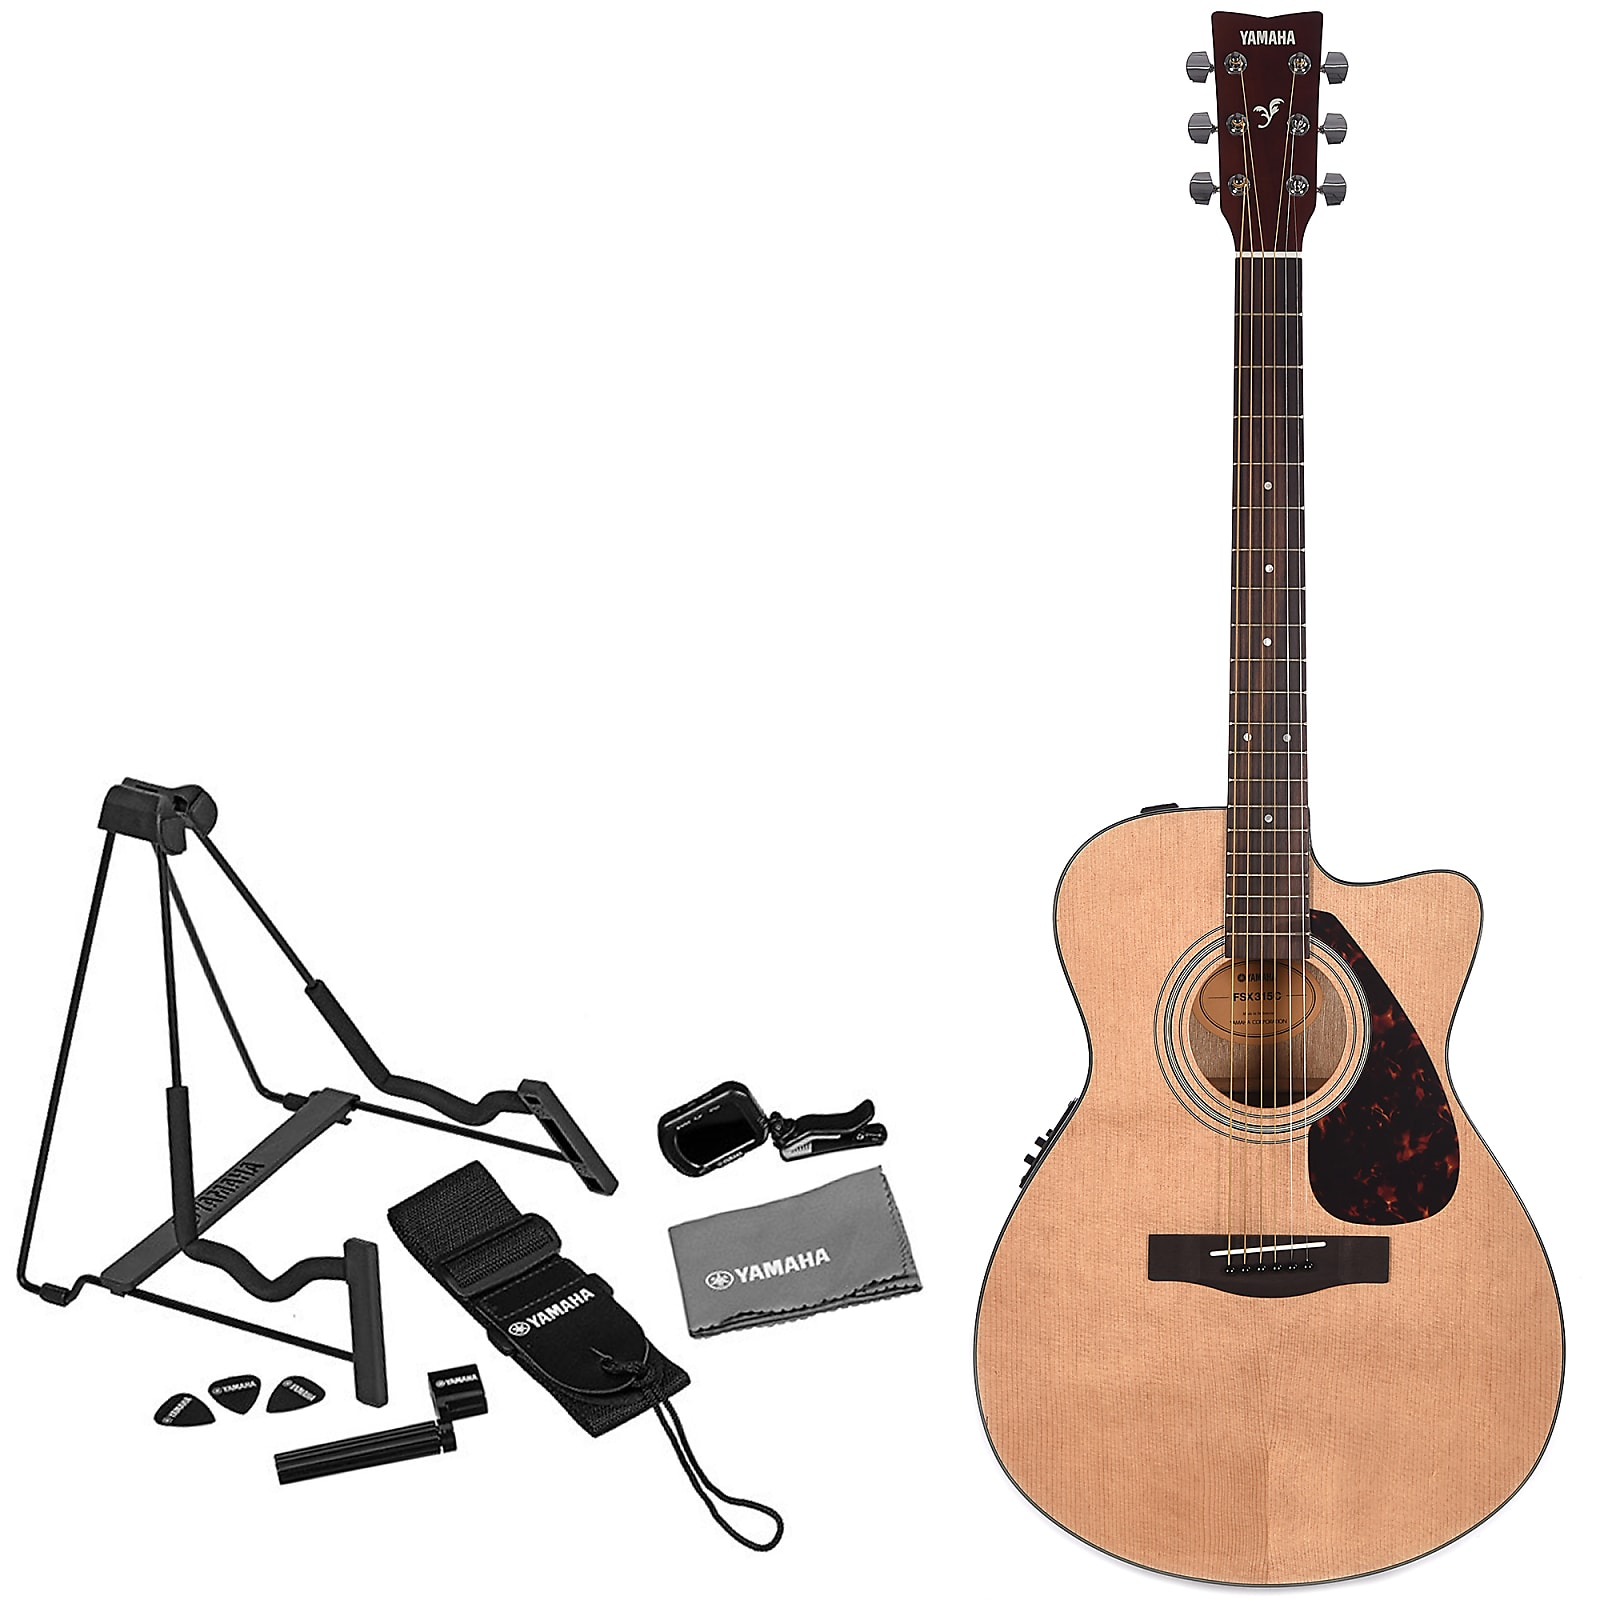 Yamaha Fsx315c Acoustic Electric Guitar Natural W Cutaway And Axpak